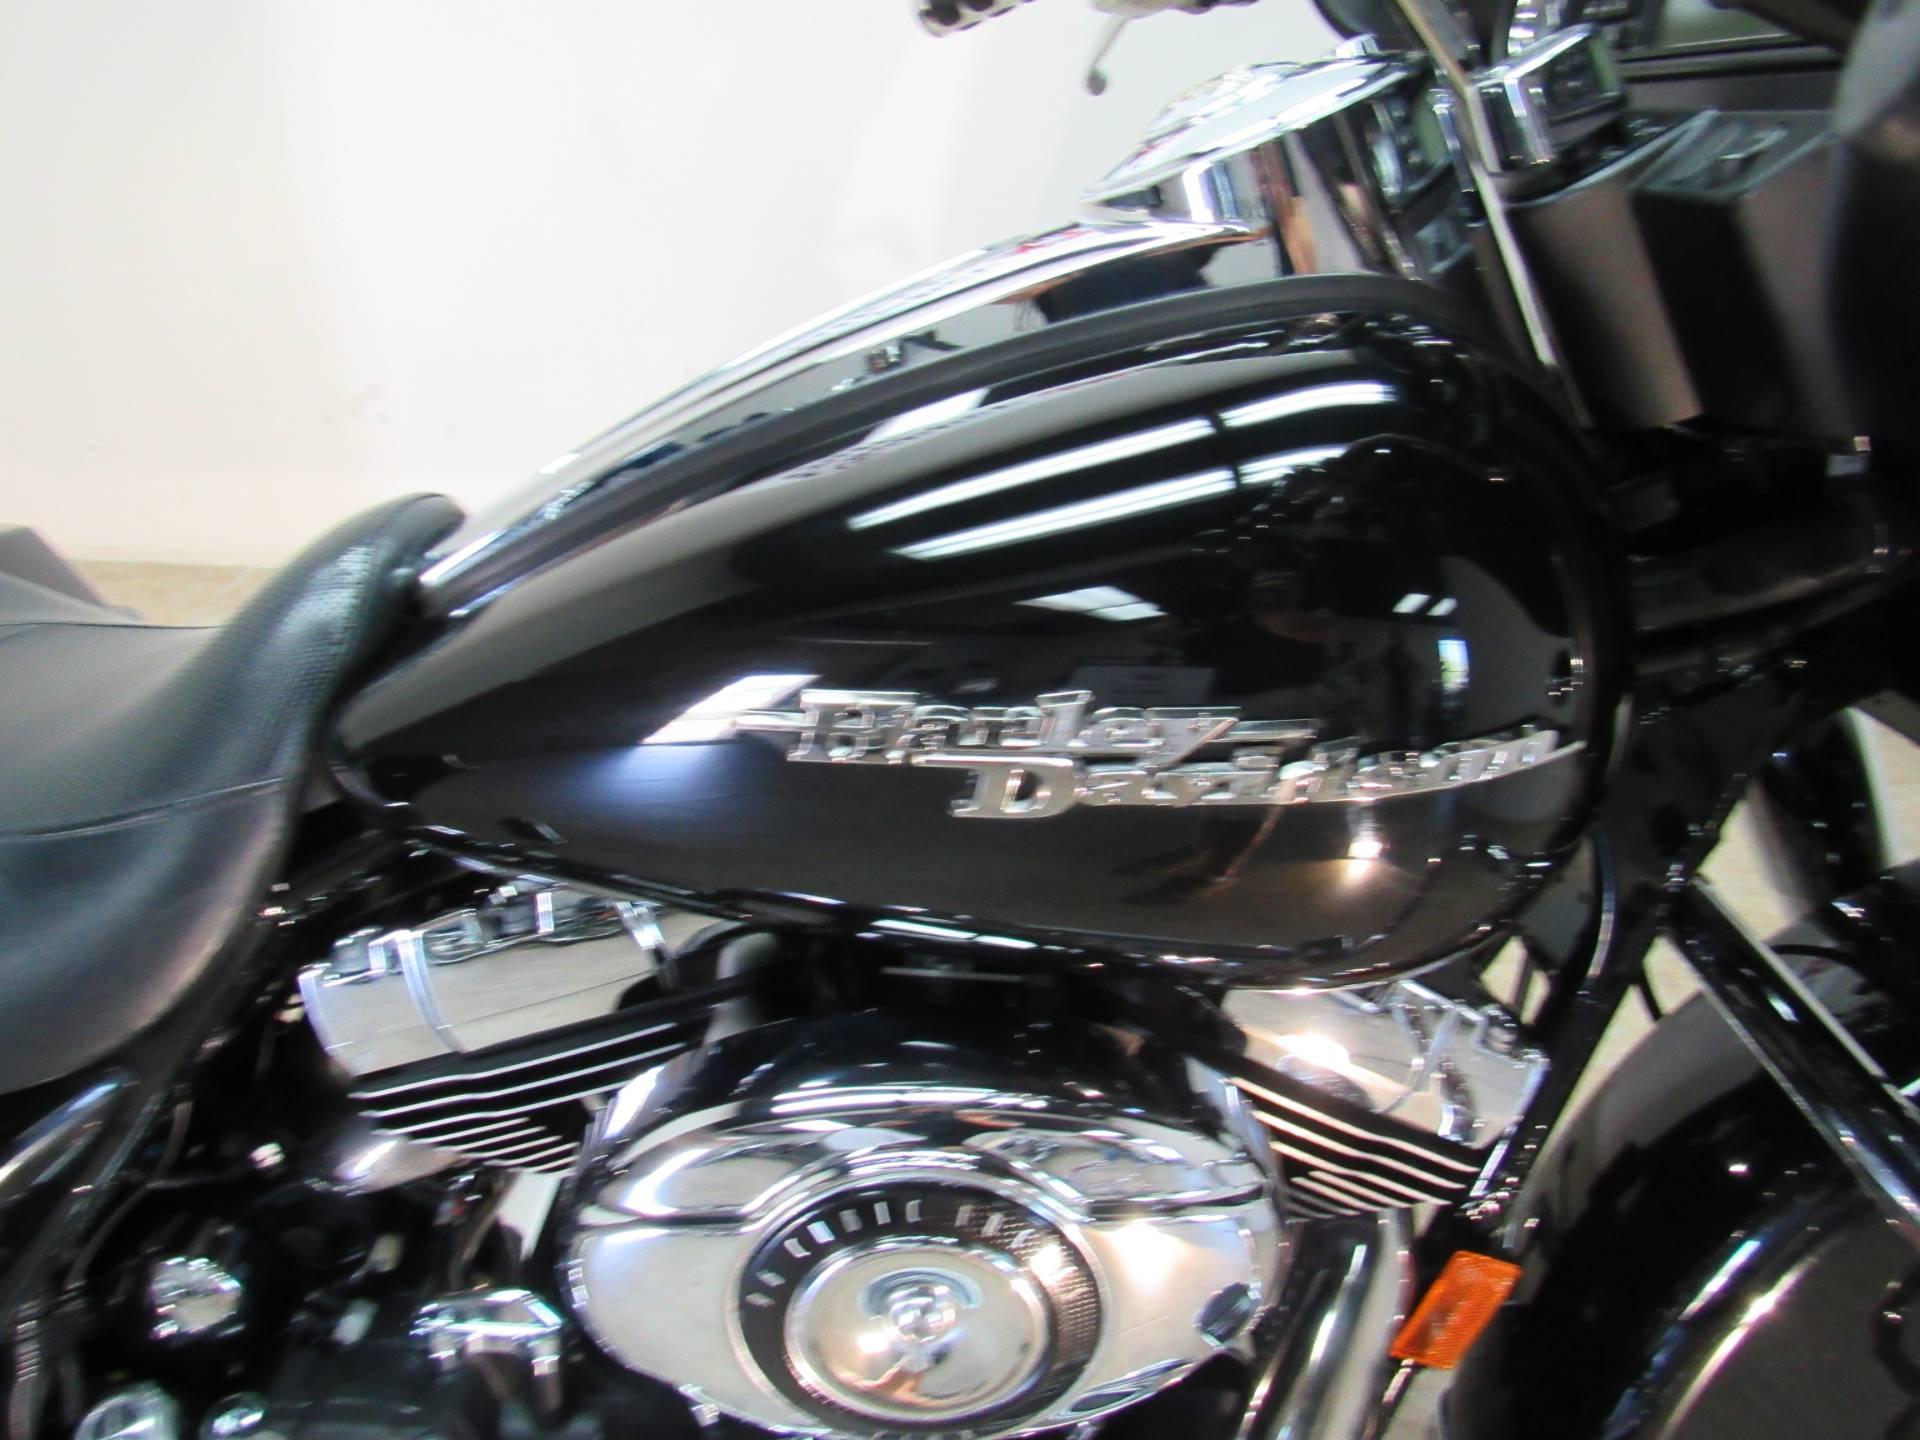 2007 Harley-Davidson Street Glide™ in Temecula, California